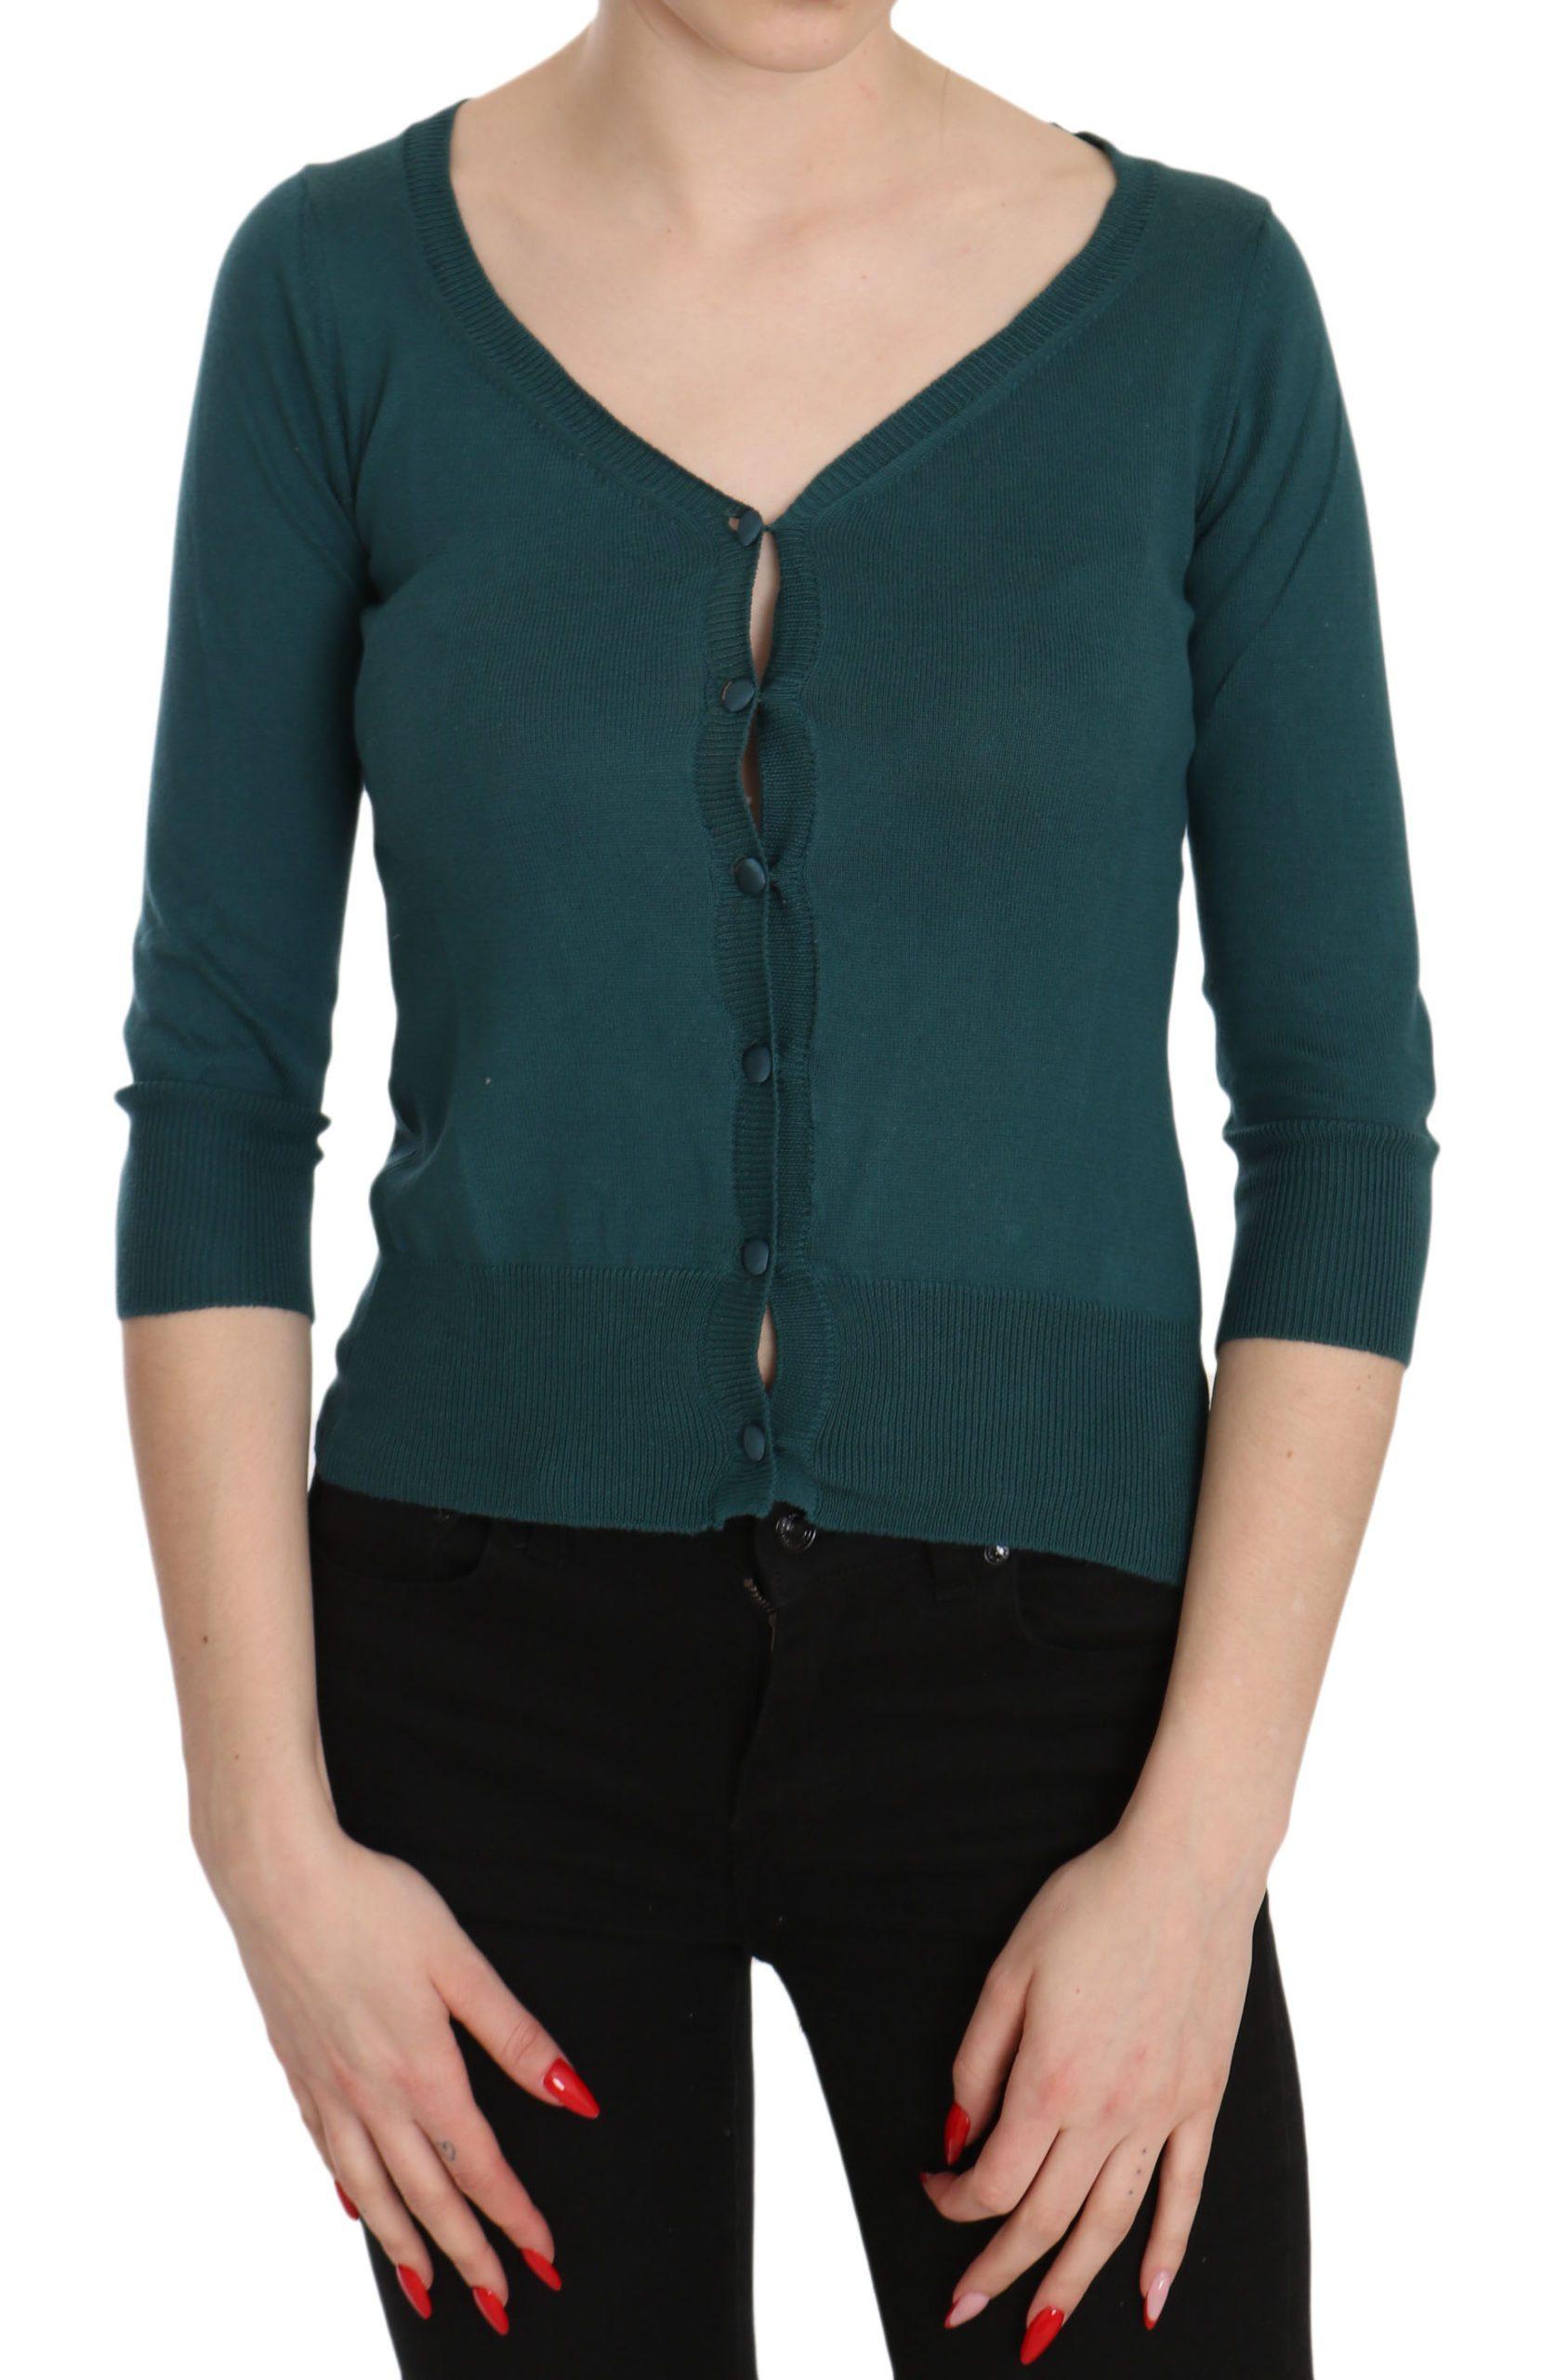 PINK MEMORIES Women's Cotton Sleeve Cardigan Top Blue TSH3459 - IT38|XS